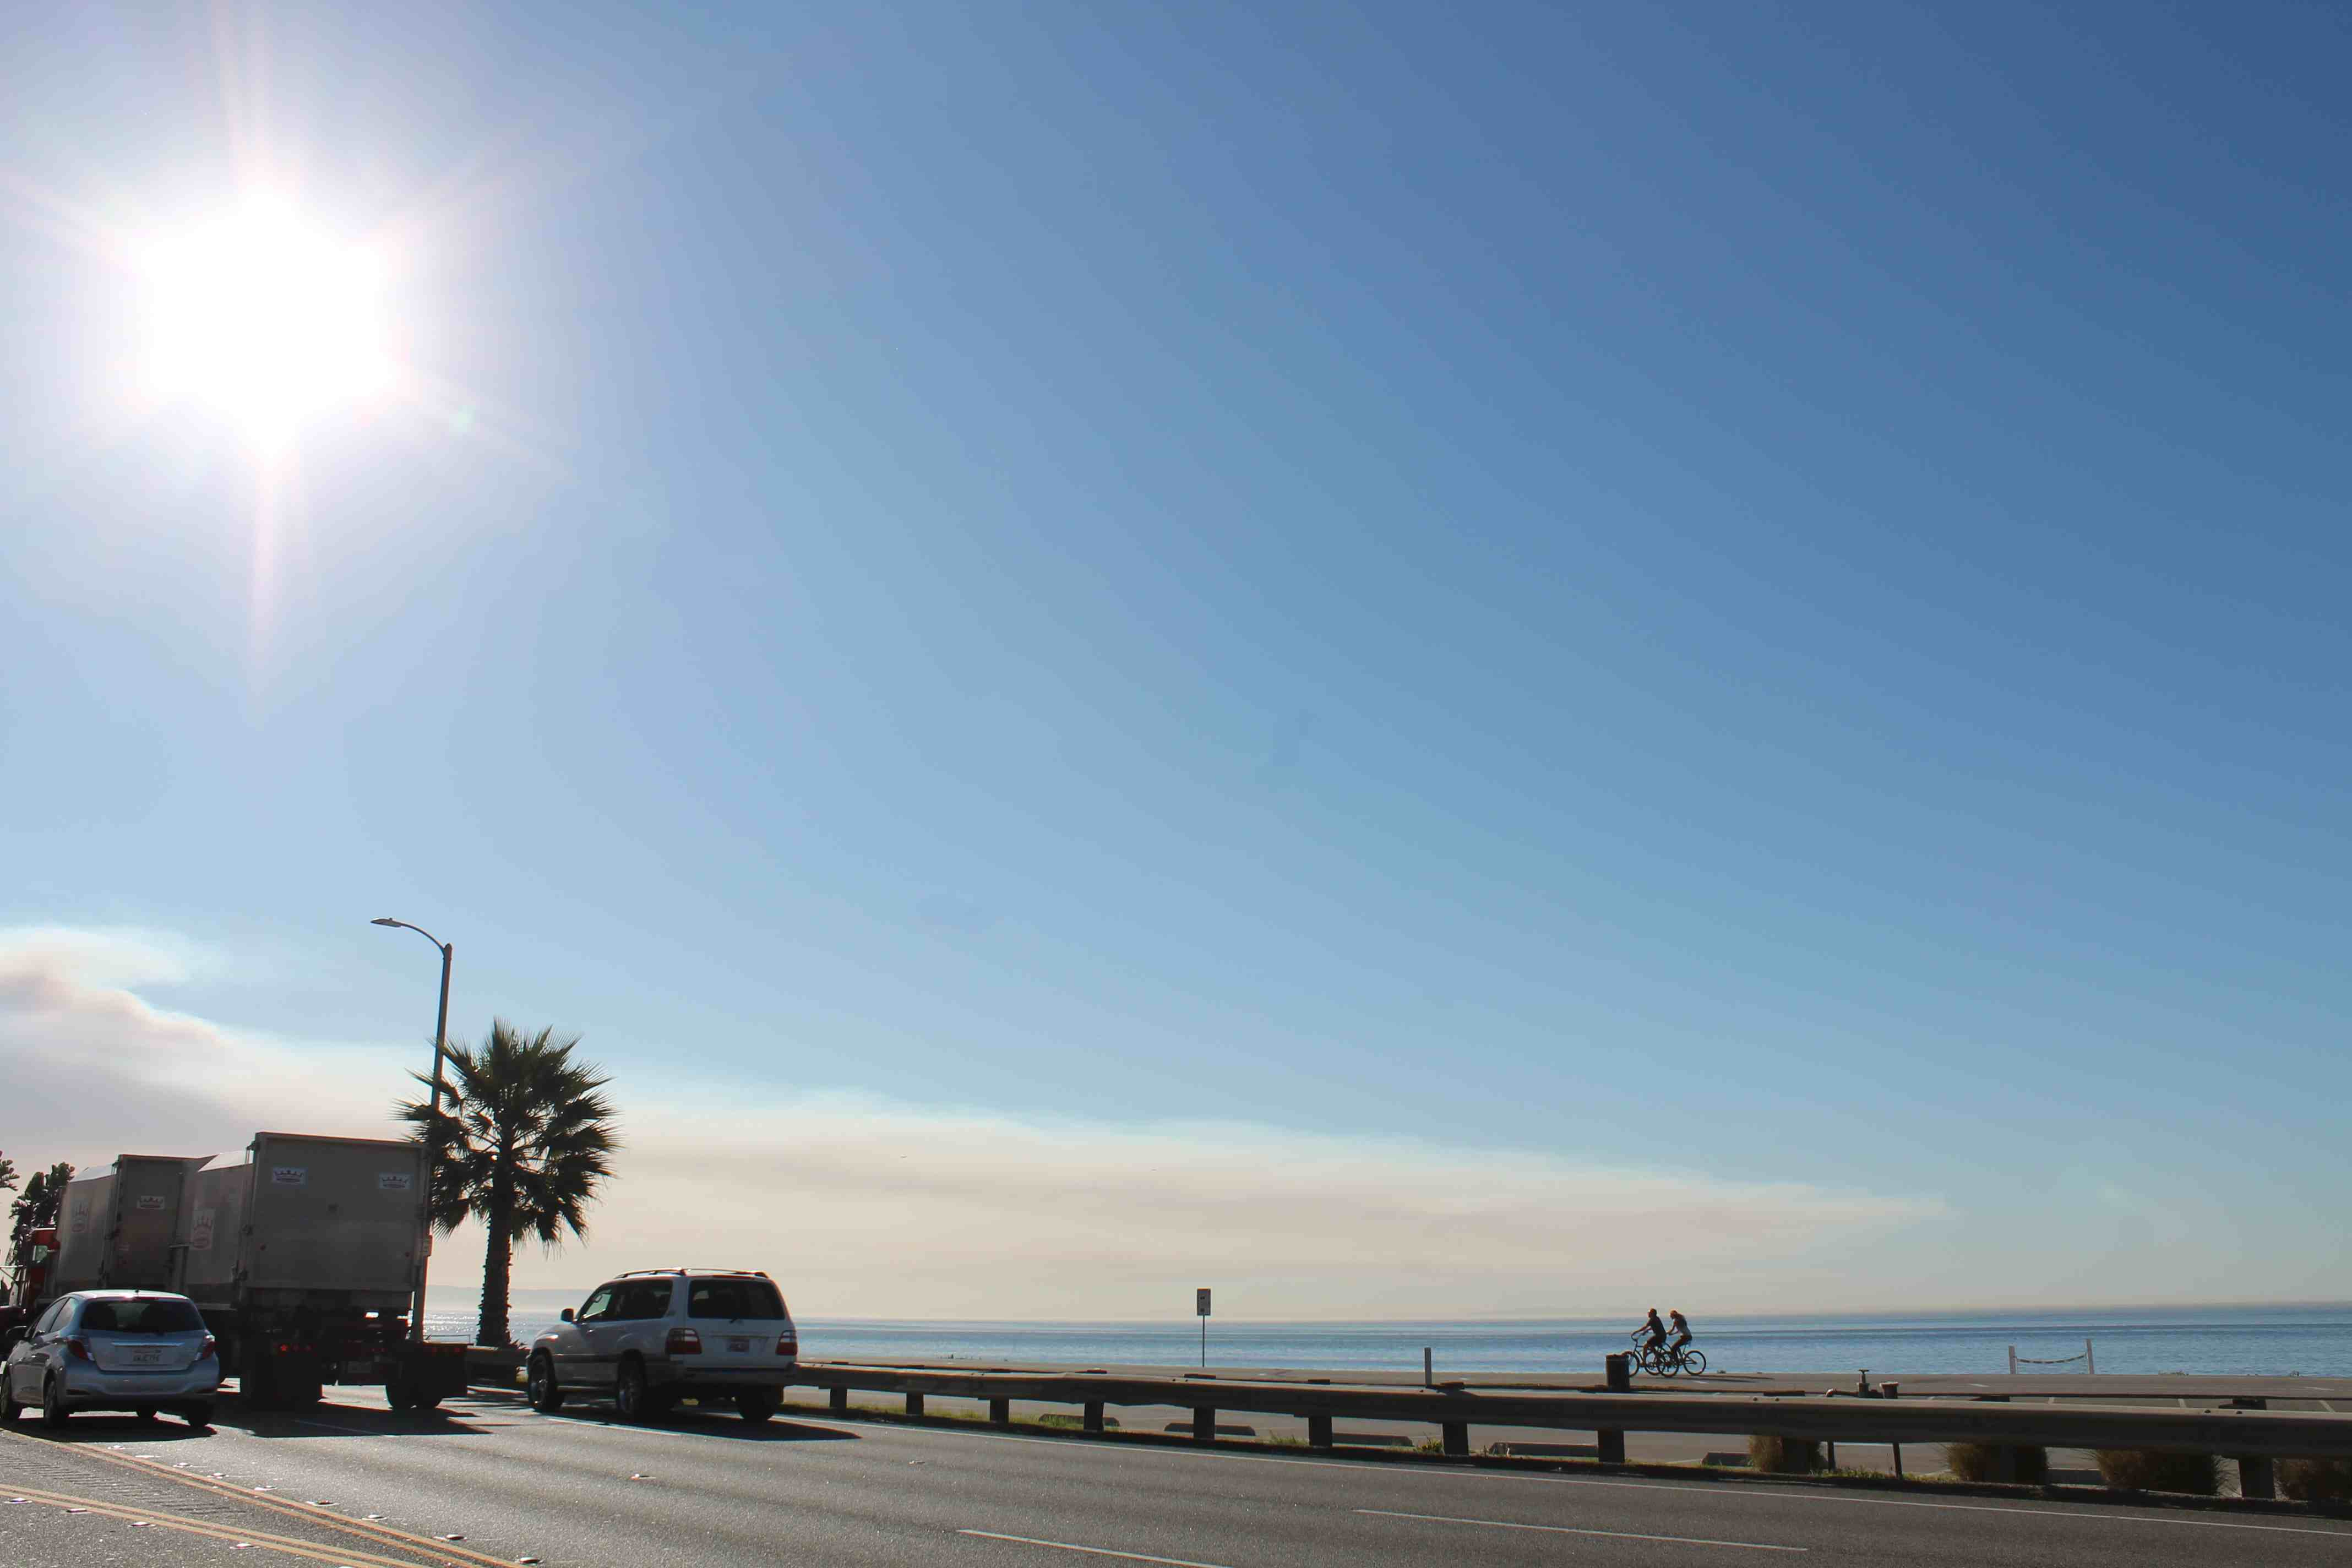 Photos: Massive LA Wildfire Spreads Smoke Across Southern California